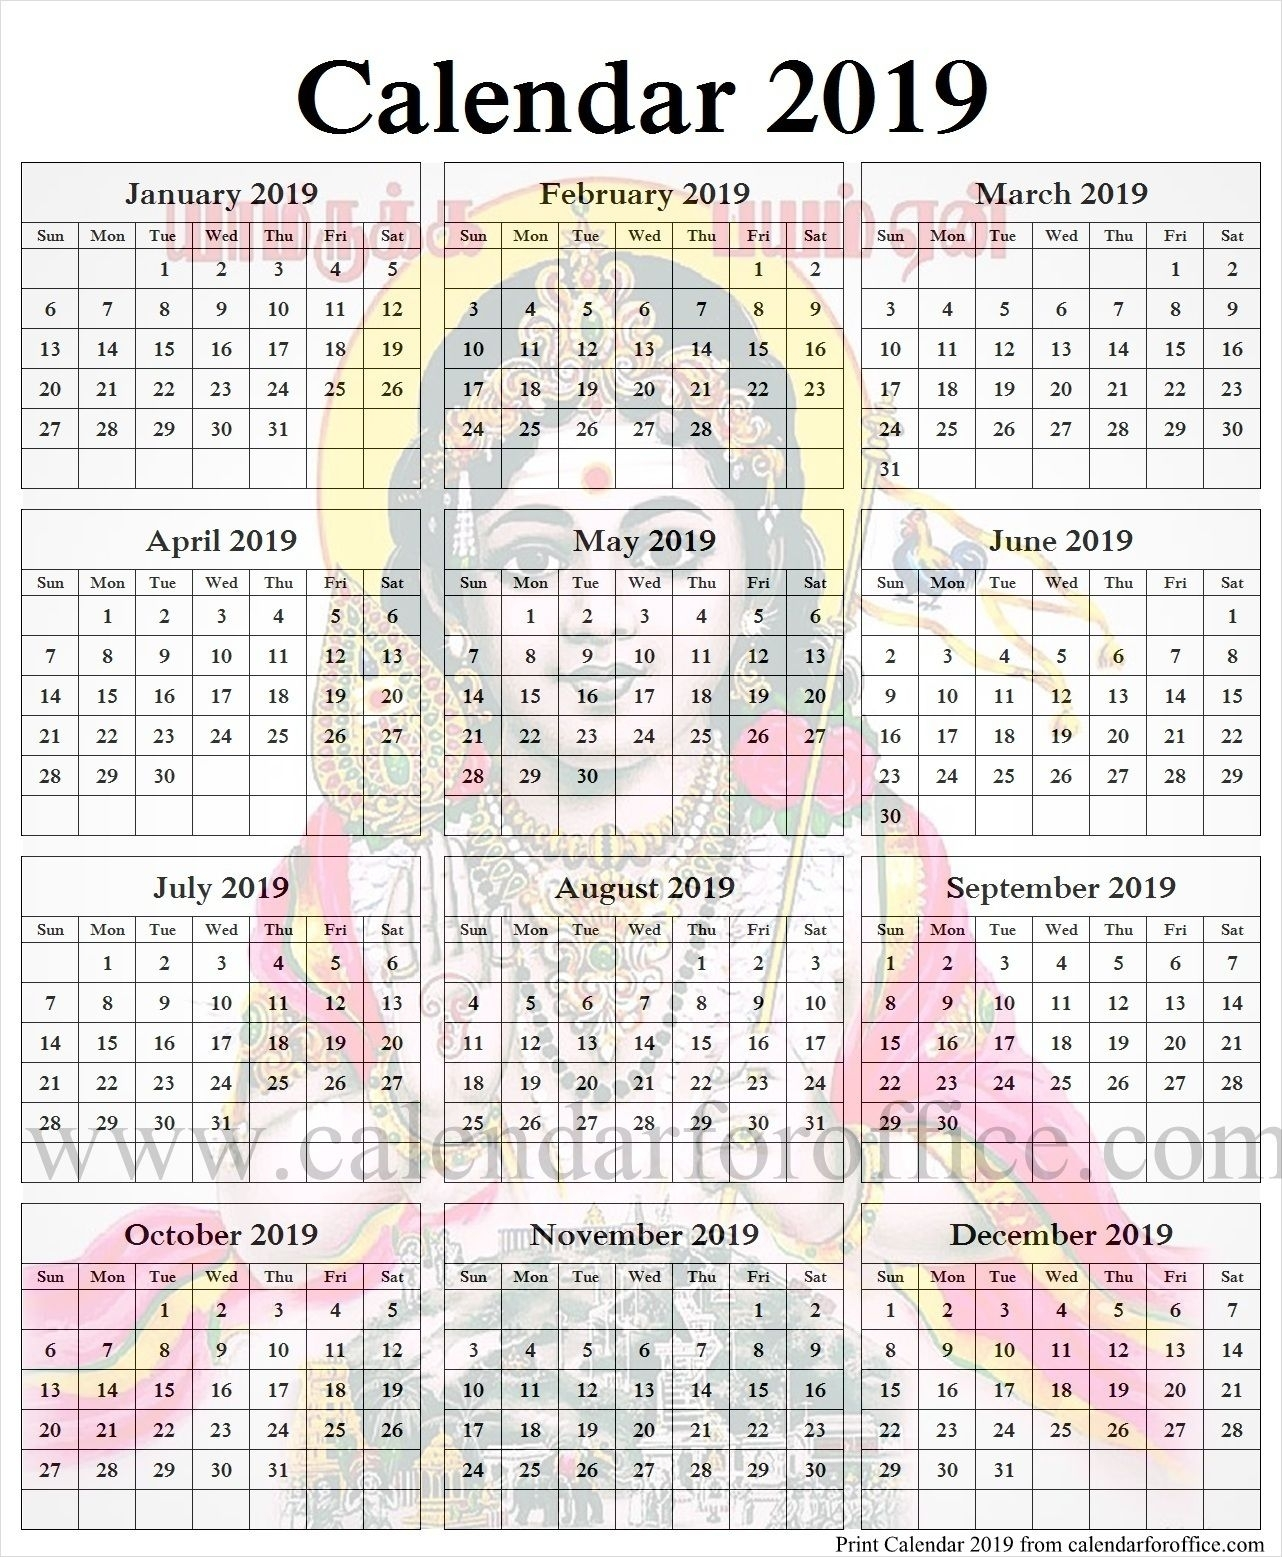 Tamil 2019 Calendar | 2019 Calendar, Calendar, Yearly Calendar